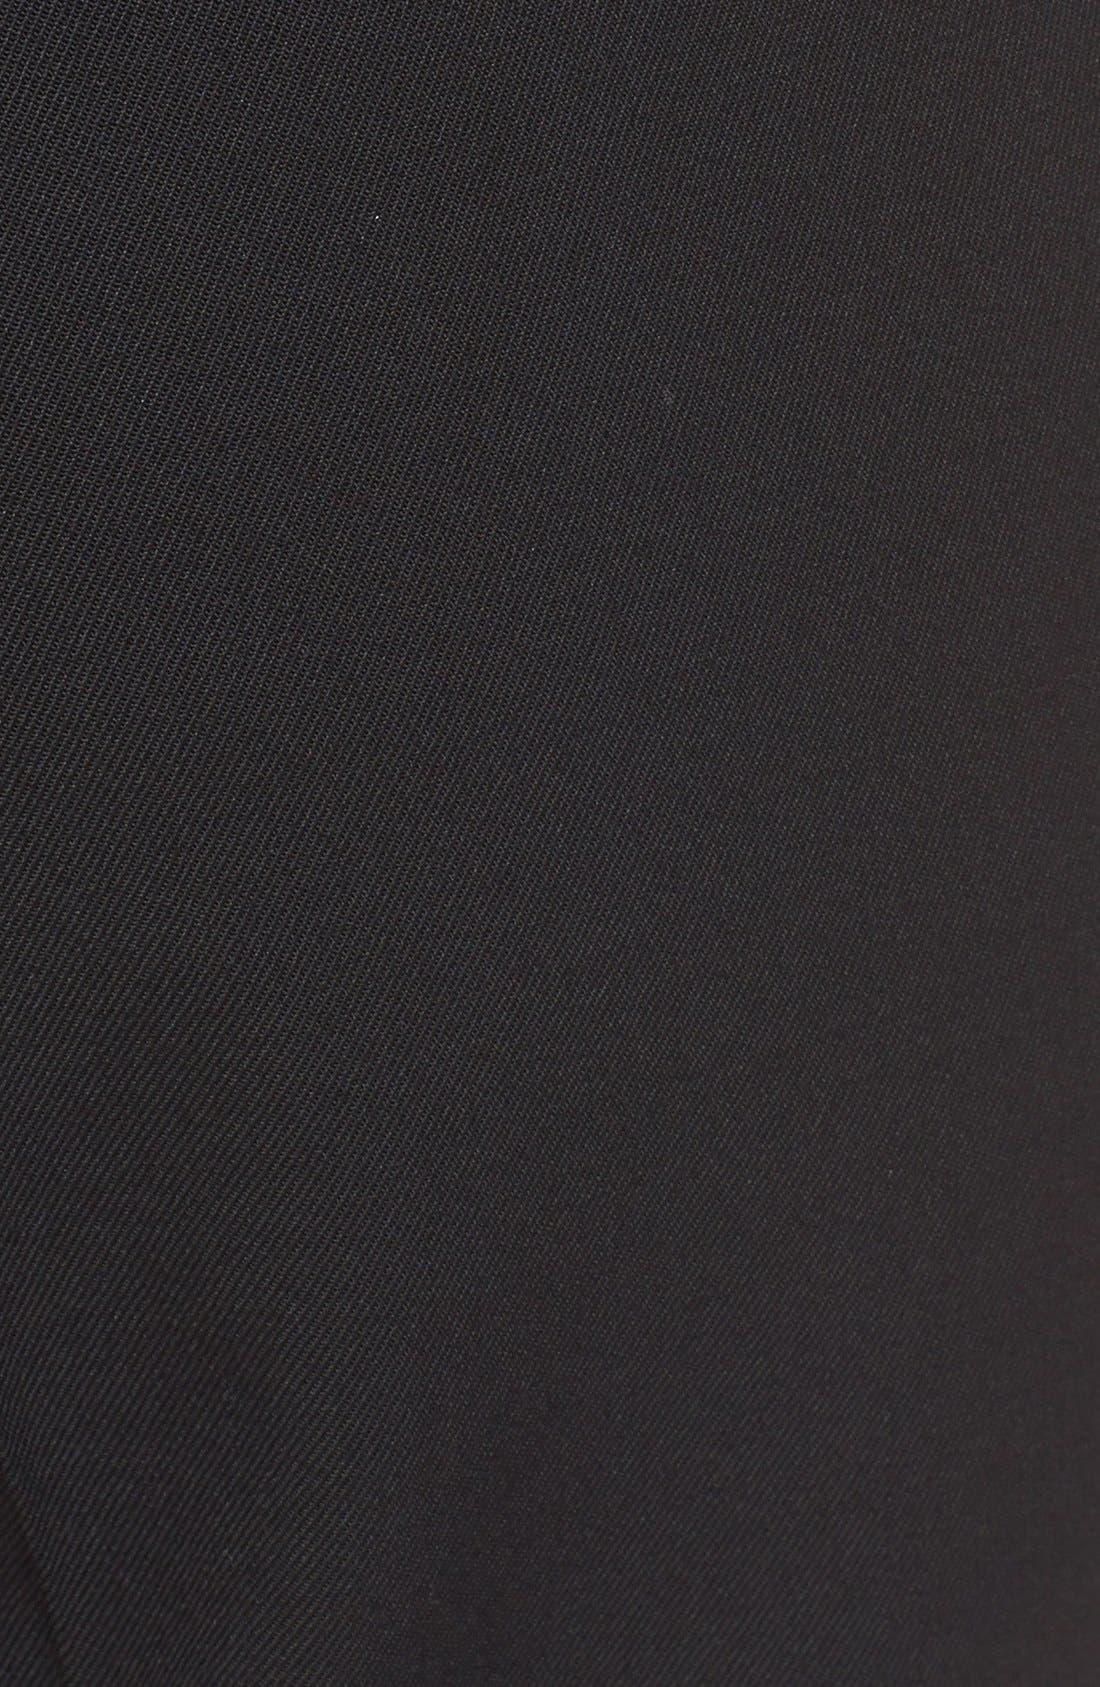 'Samantha' Stretch Wool Straight Leg Pants,                             Alternate thumbnail 6, color,                             BLACK